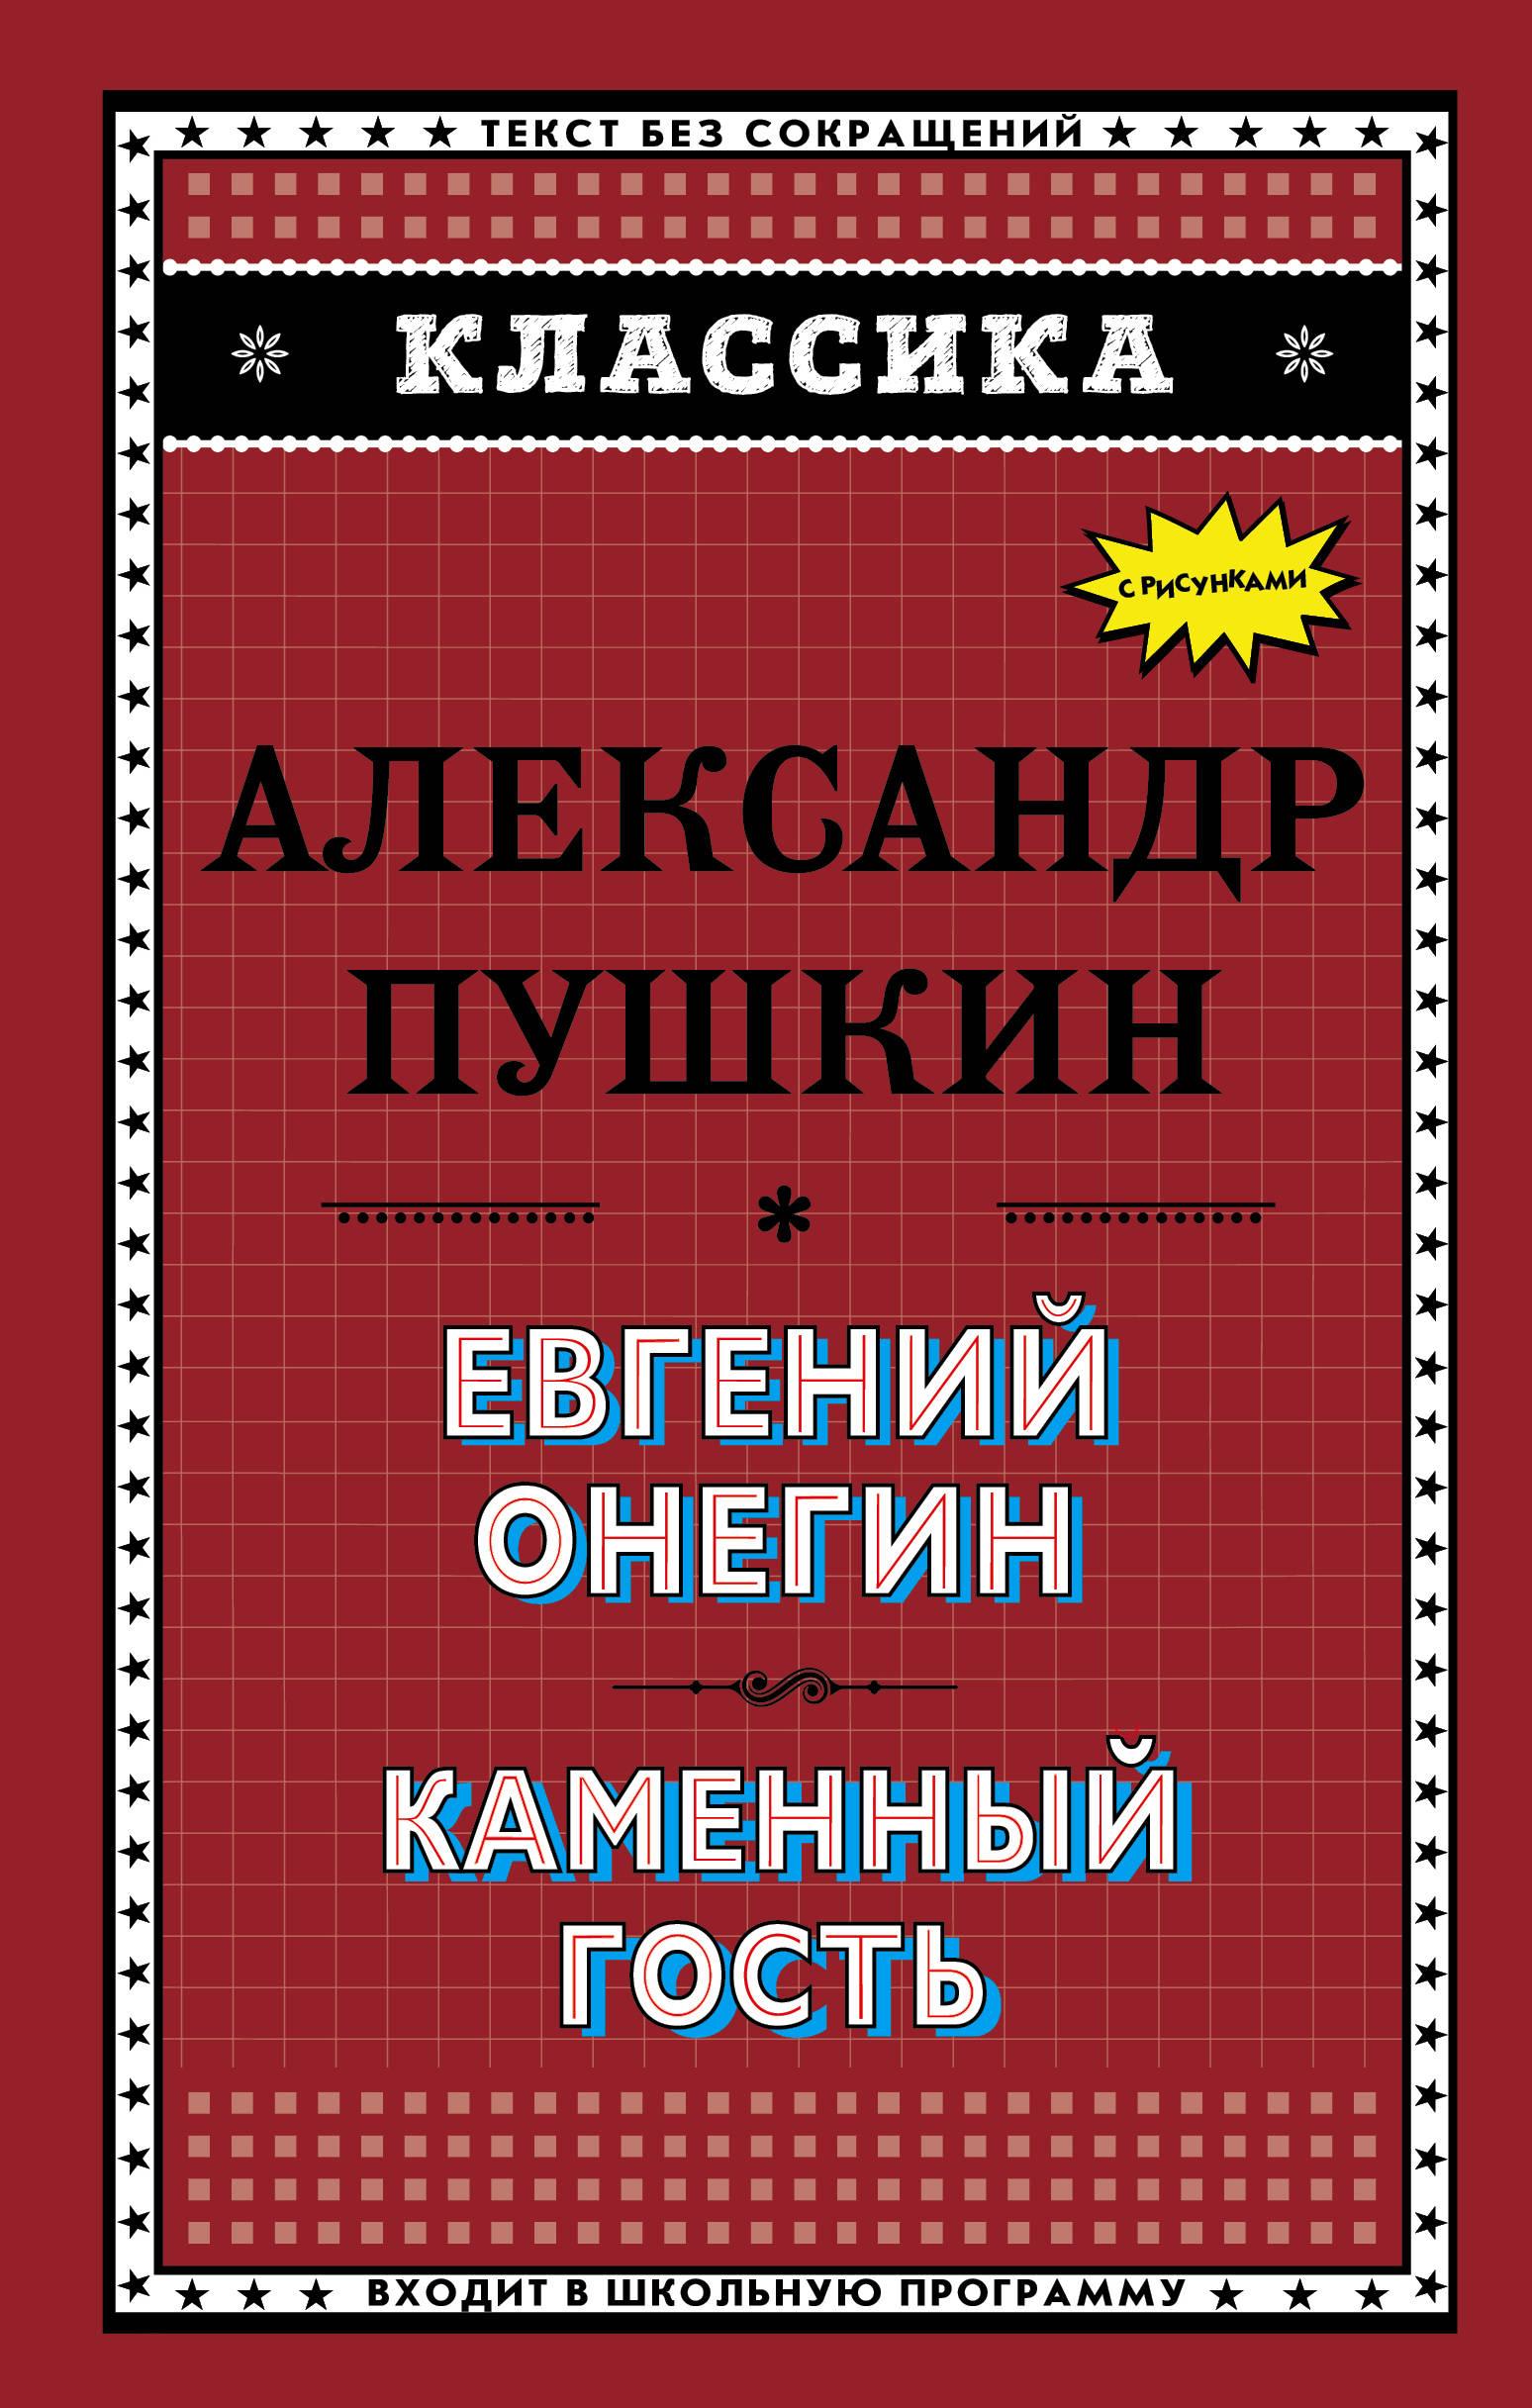 Пушкин Александр Сергеевич Евгений Онегин. Каменный гость ISBN: 978-5-04-095234-2